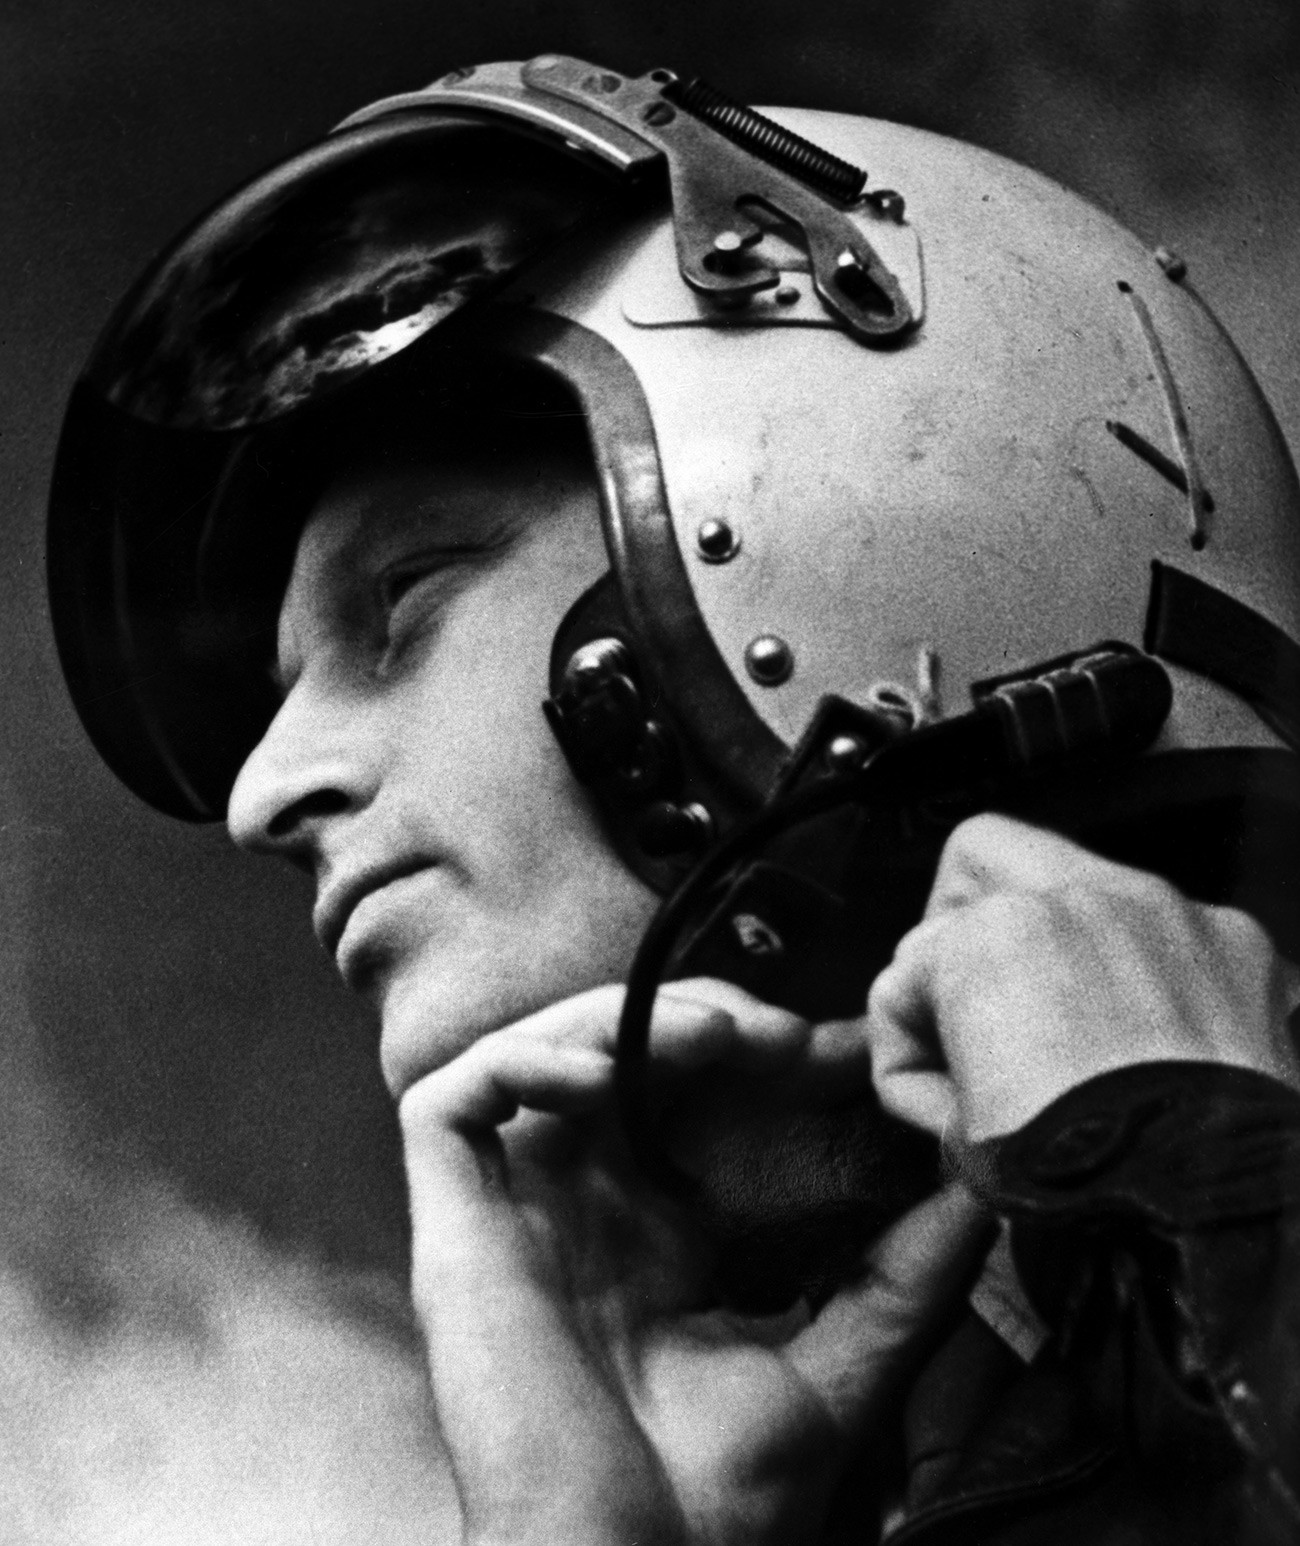 The son of legendary Soviet aircraft designer and test pilot Vladimir Ilyushin.